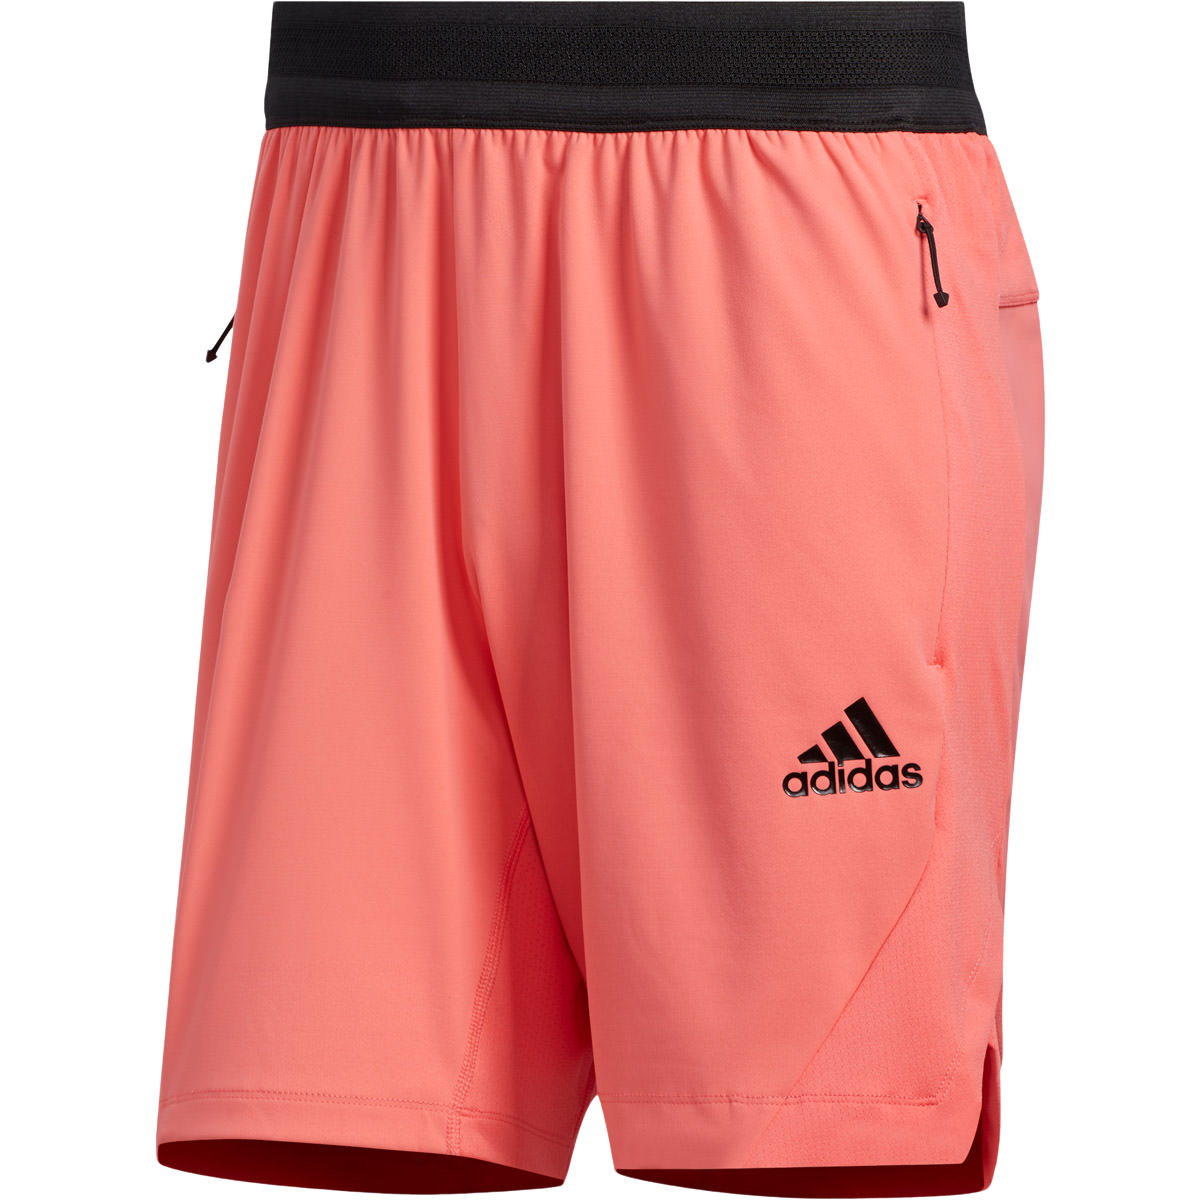 adidas Heat Ready Træningsshorts Herre